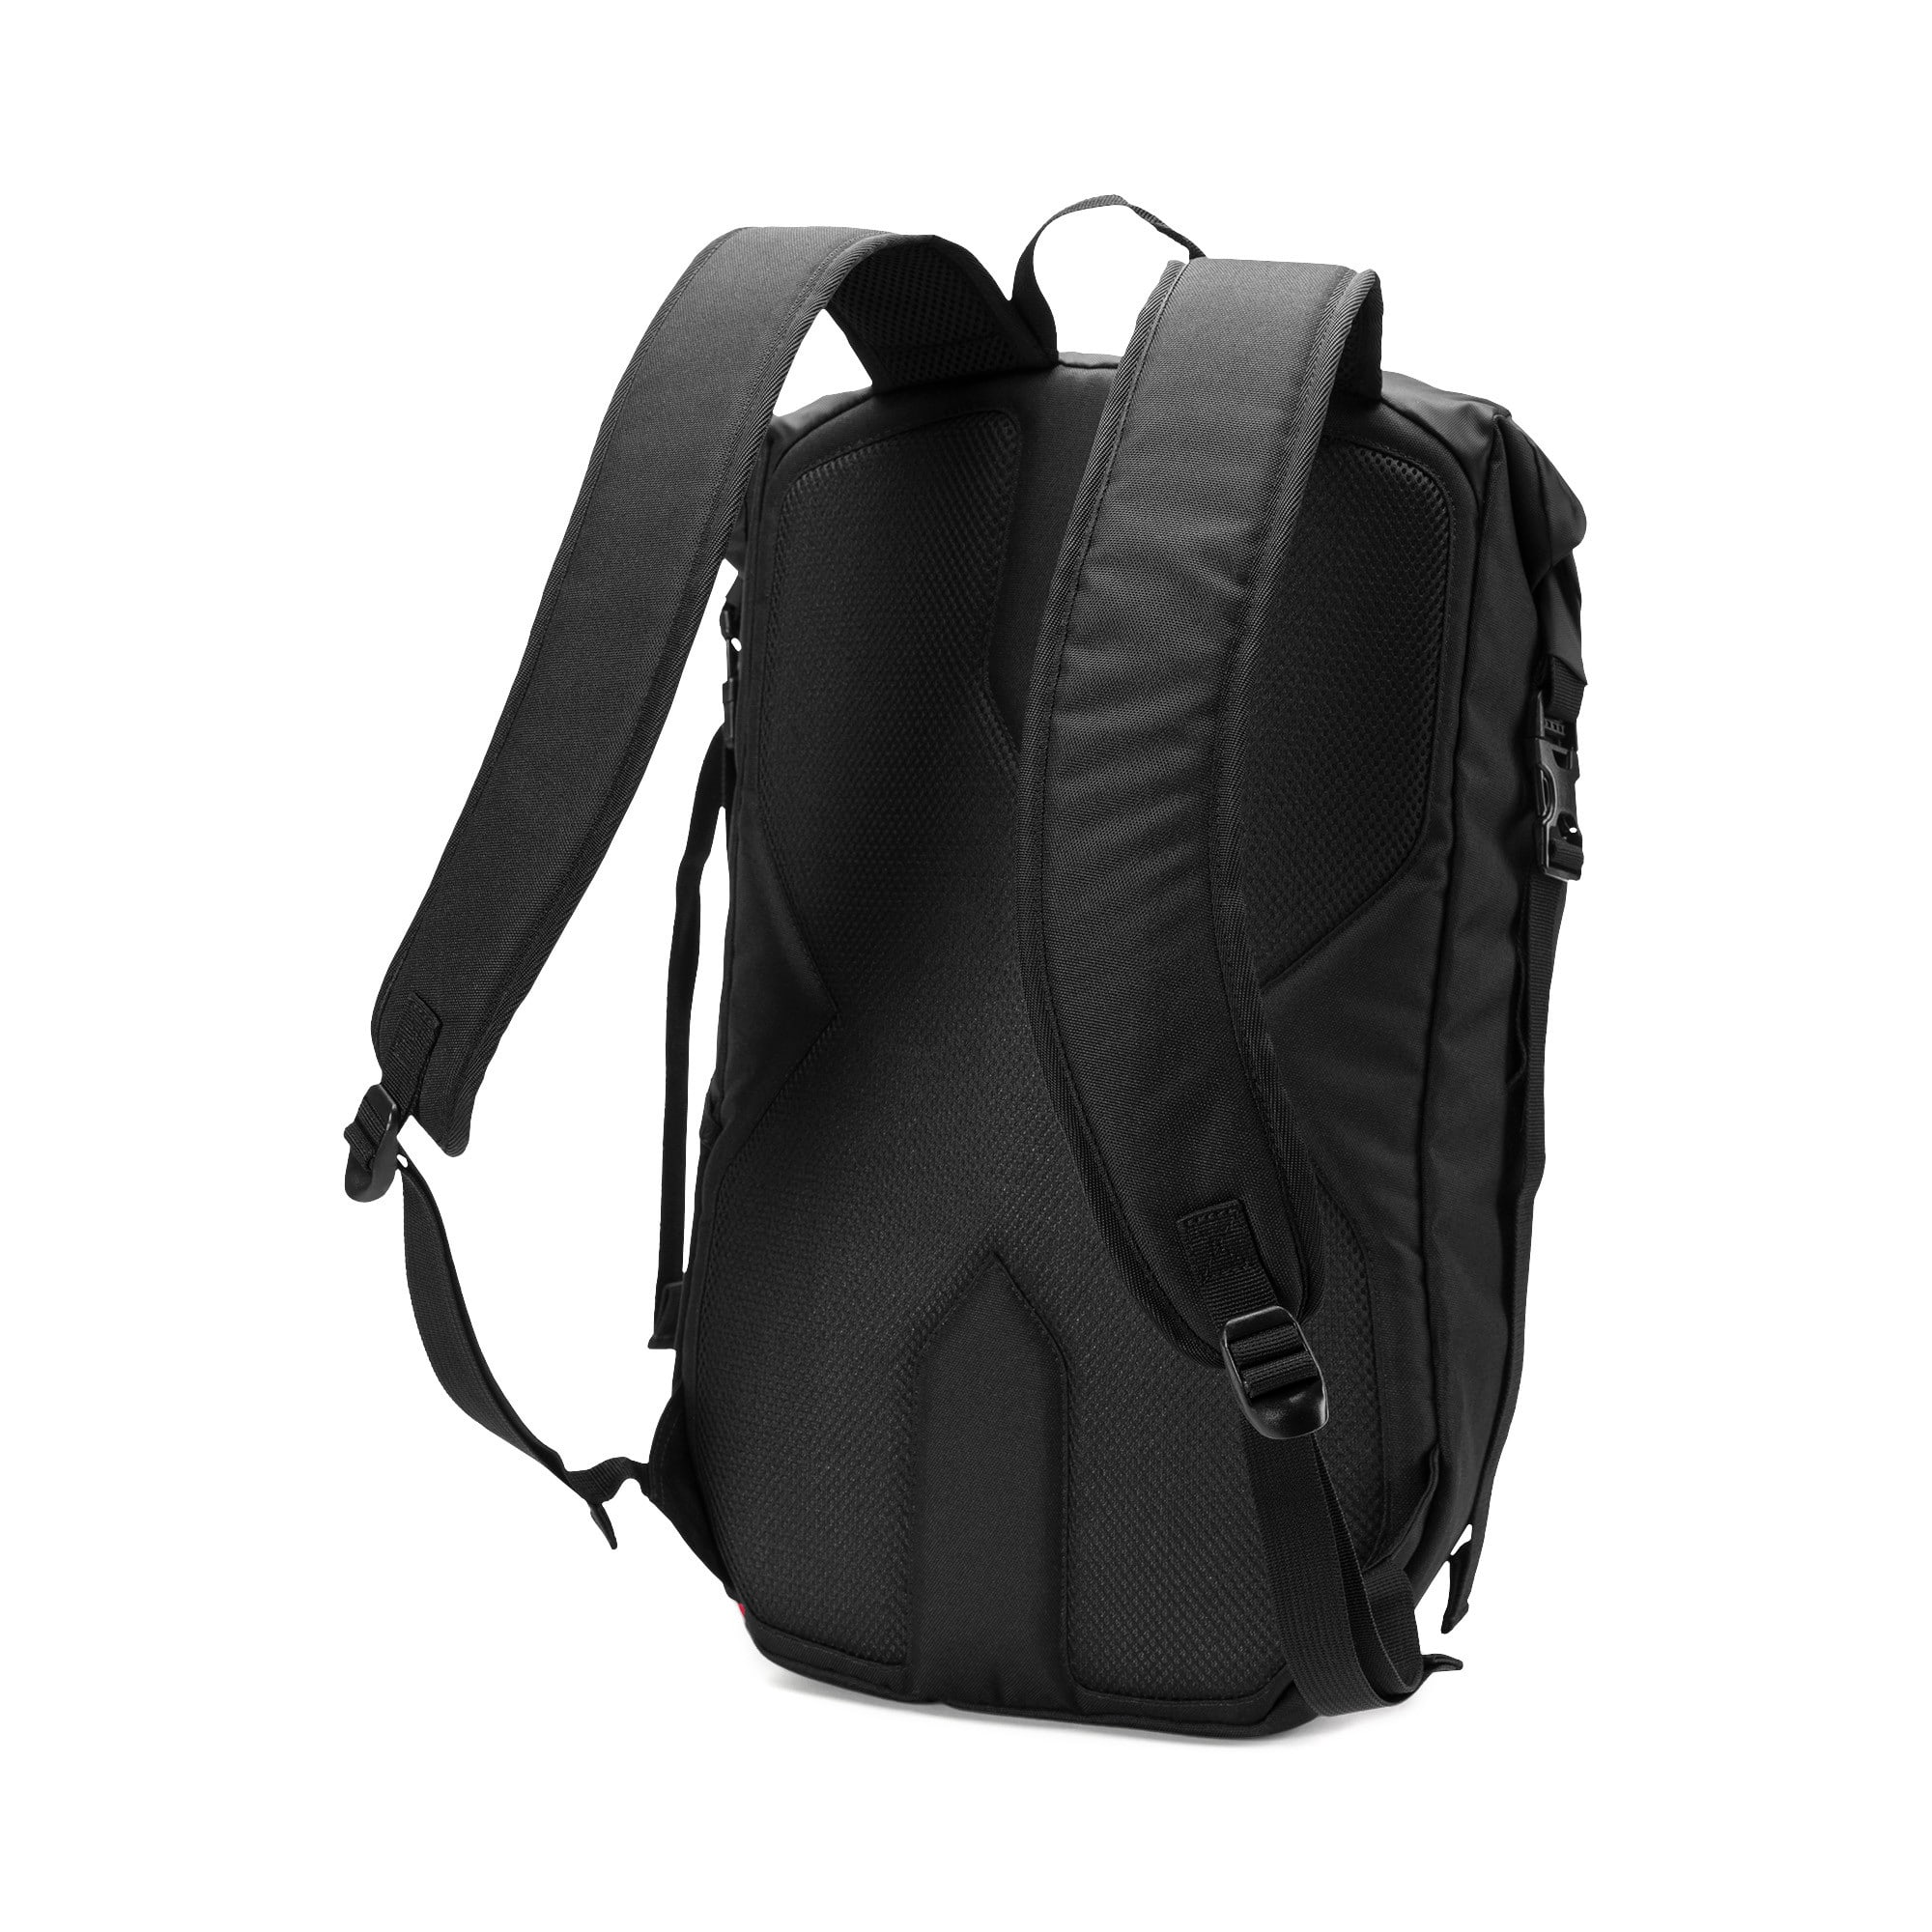 Thumbnail 2 of AC Milan Football Culture Rolltop Backpack, Puma Black-Tango Red, medium